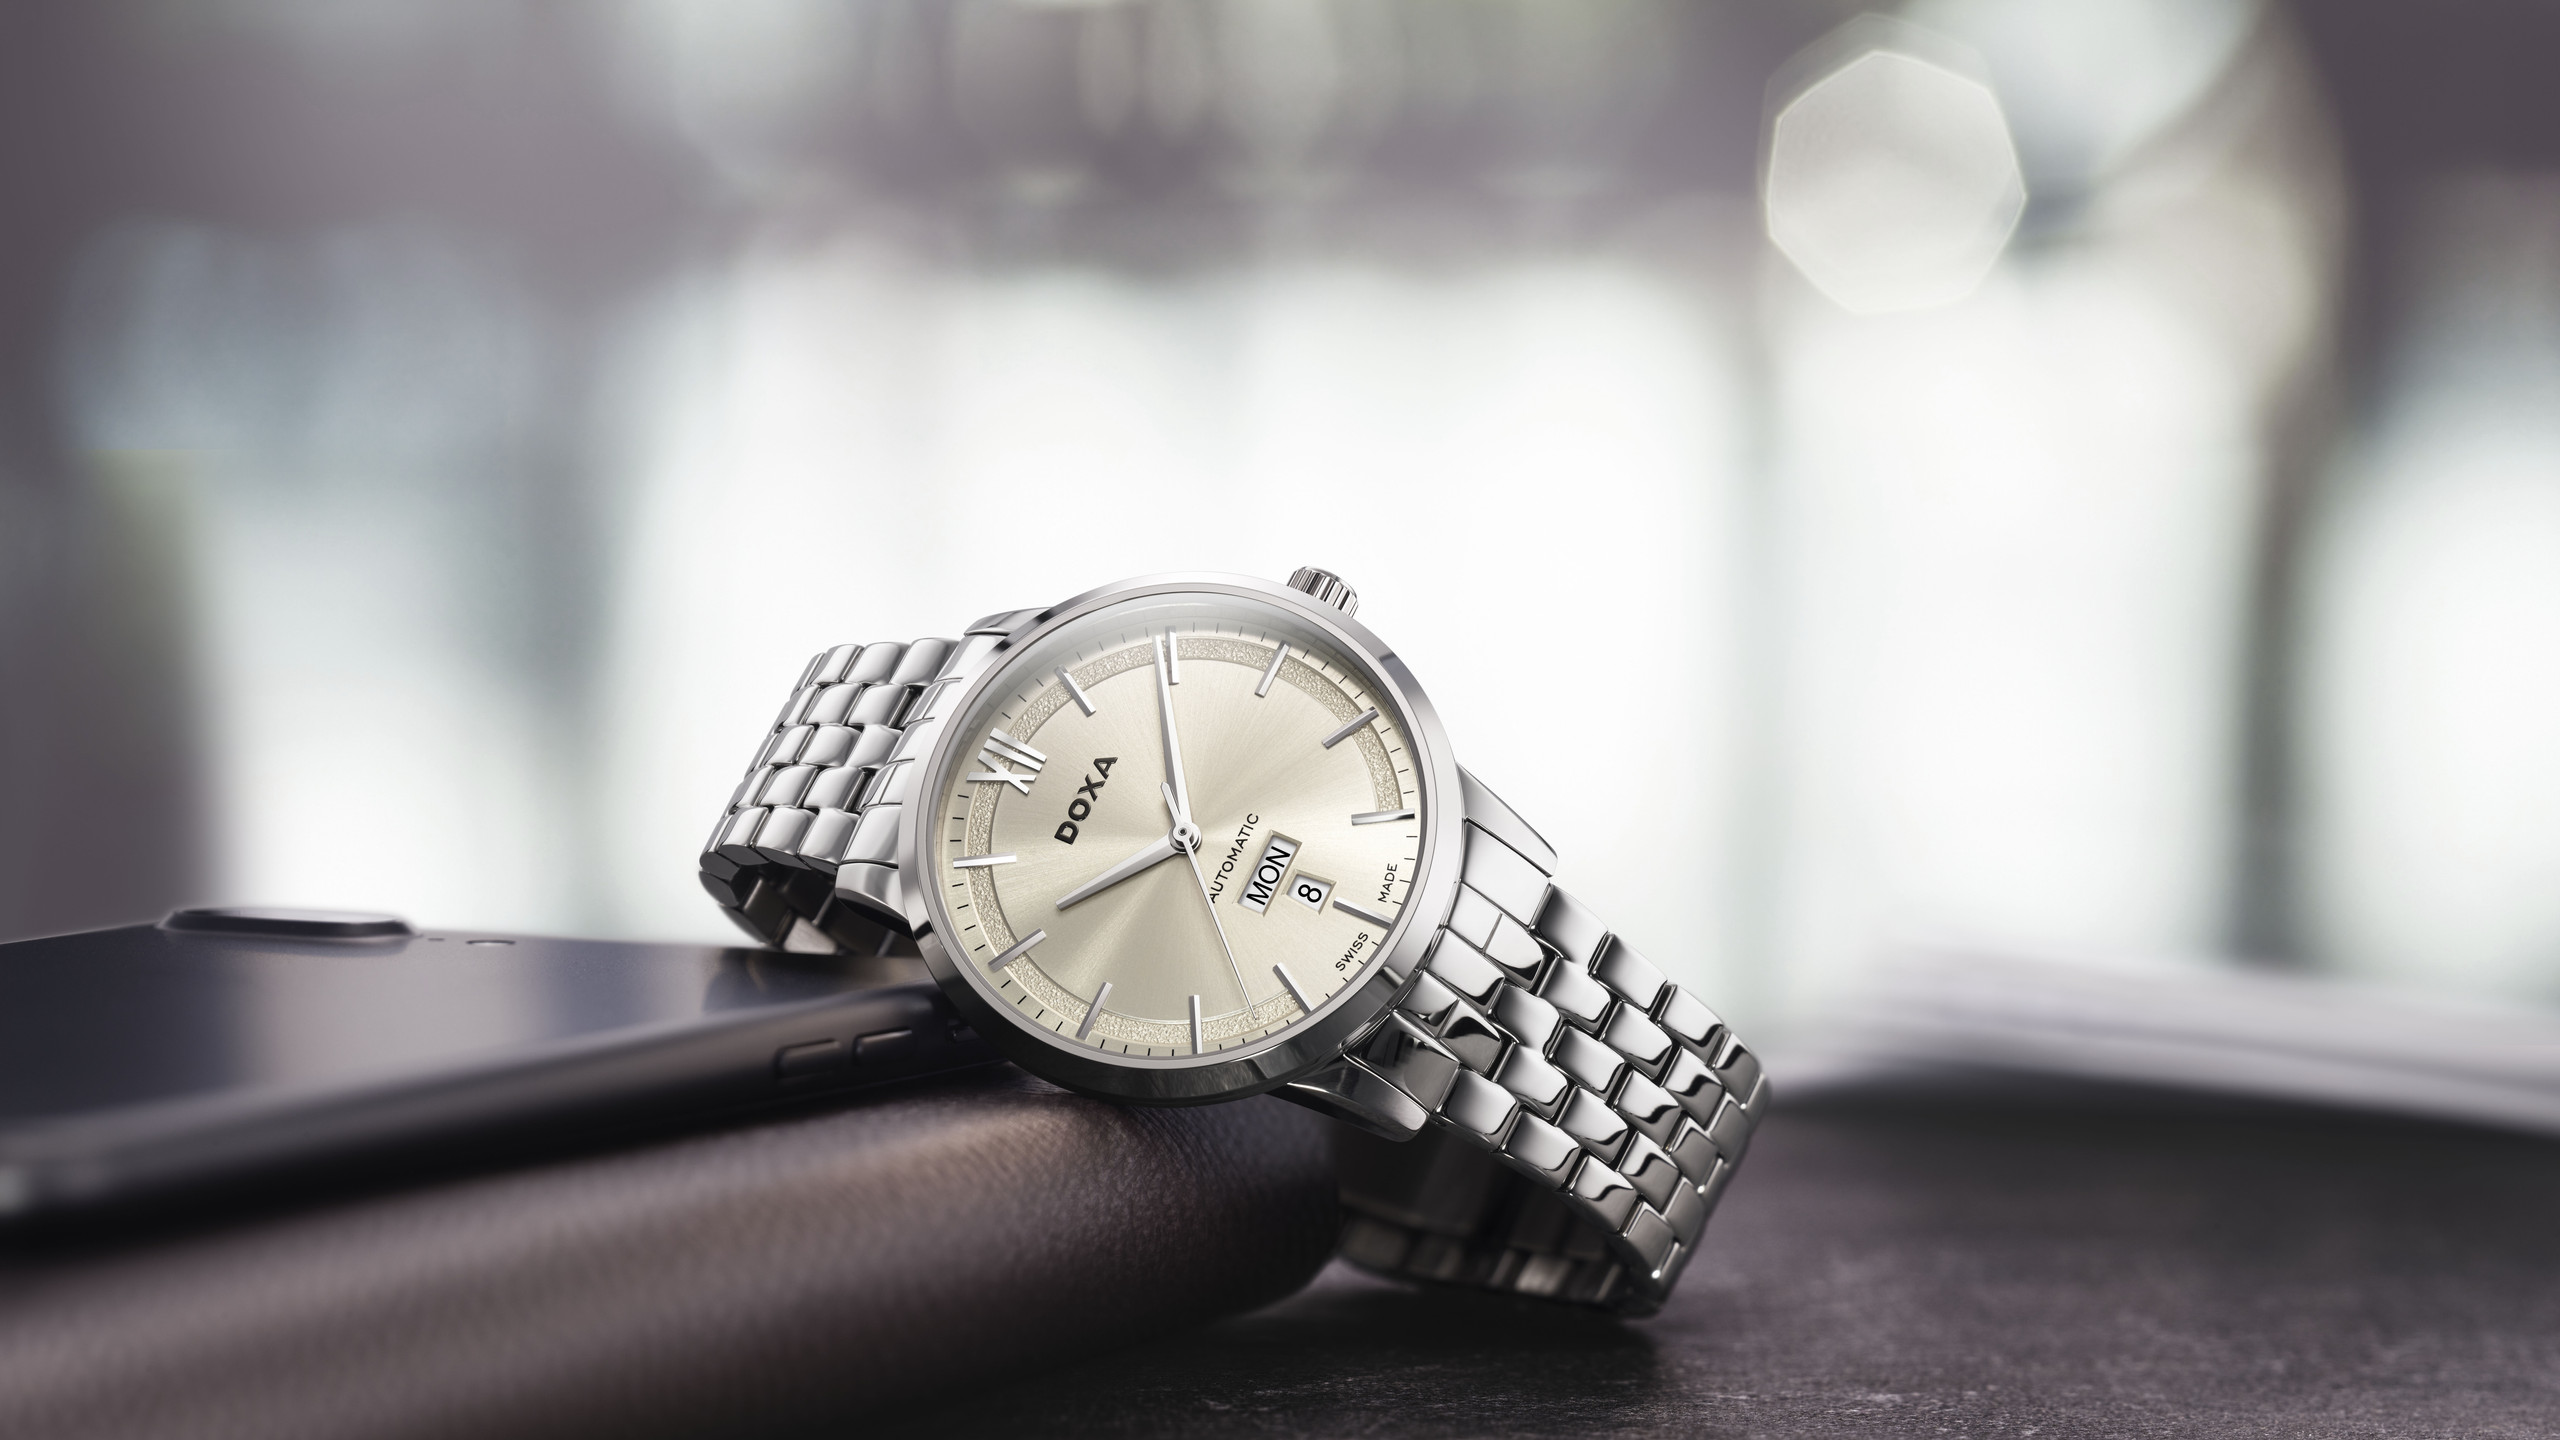 DOXA Executive  直徑41.5毫米精鋼錶殼∕時間指示,星期日曆顯示∕ 瑞士自動上鍊機芯∕防水50米/HK$5,850